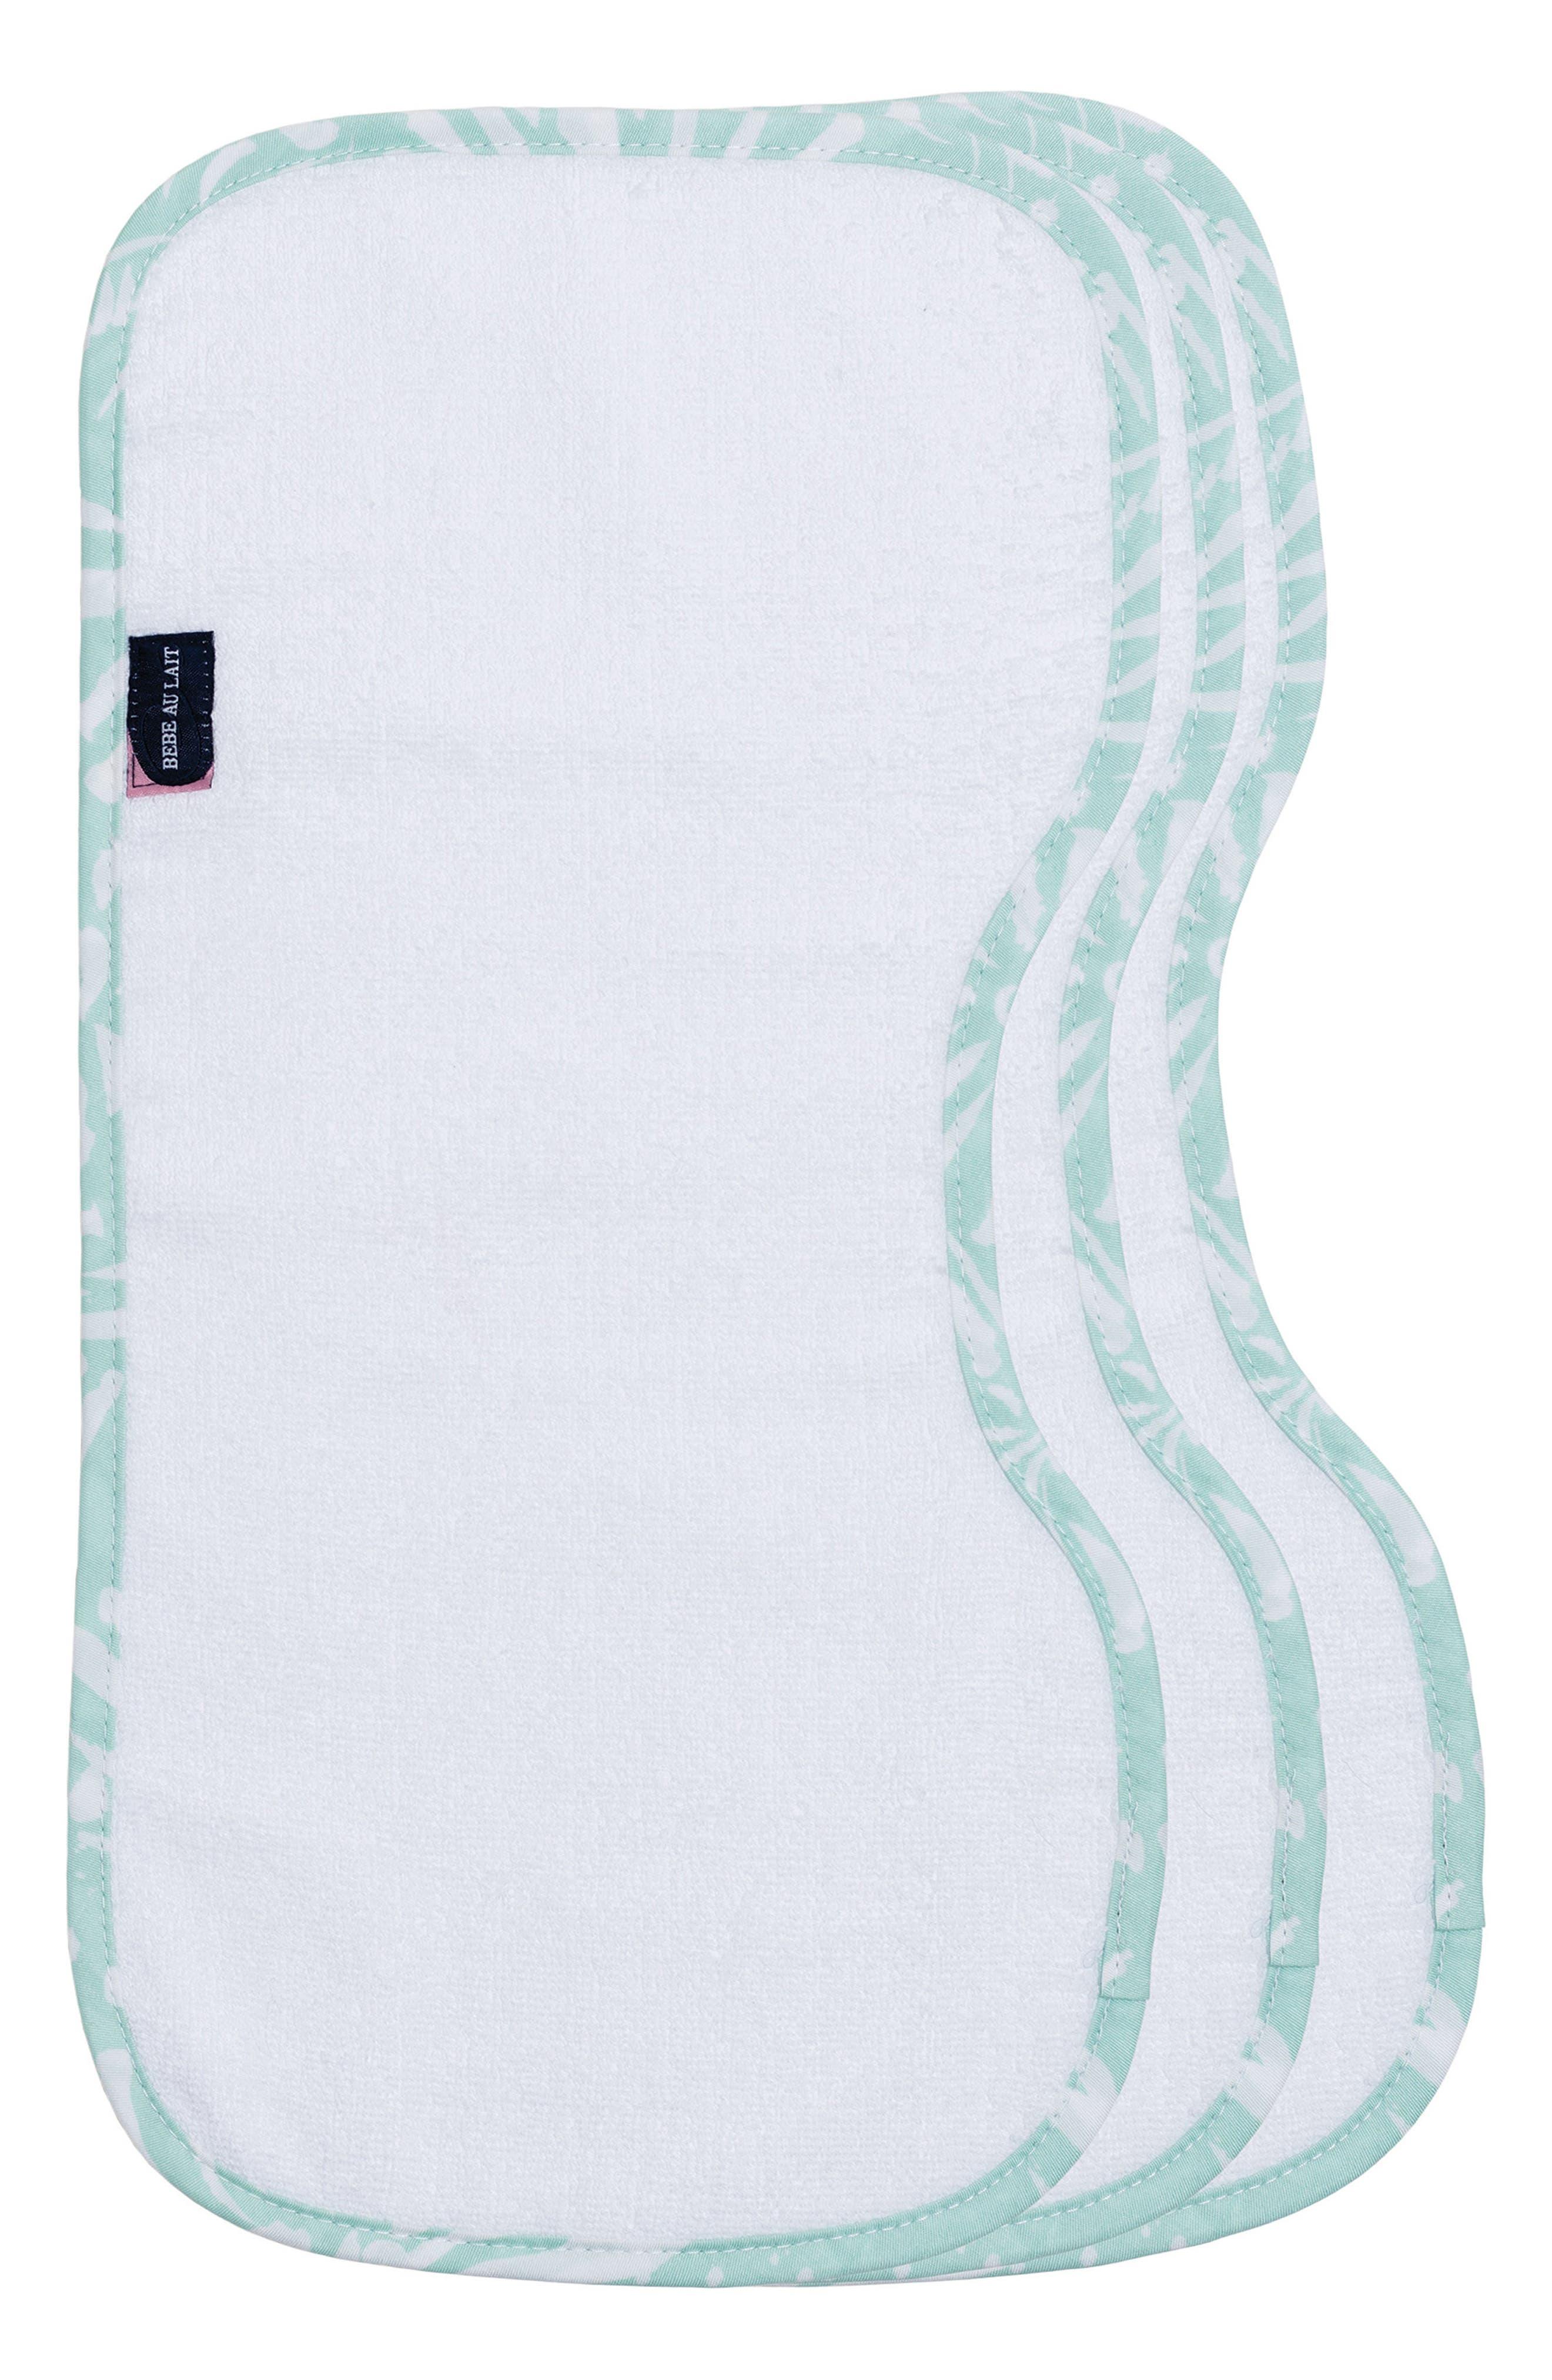 Nursing Cover & Burp Cloth Set,                             Alternate thumbnail 4, color,                             400